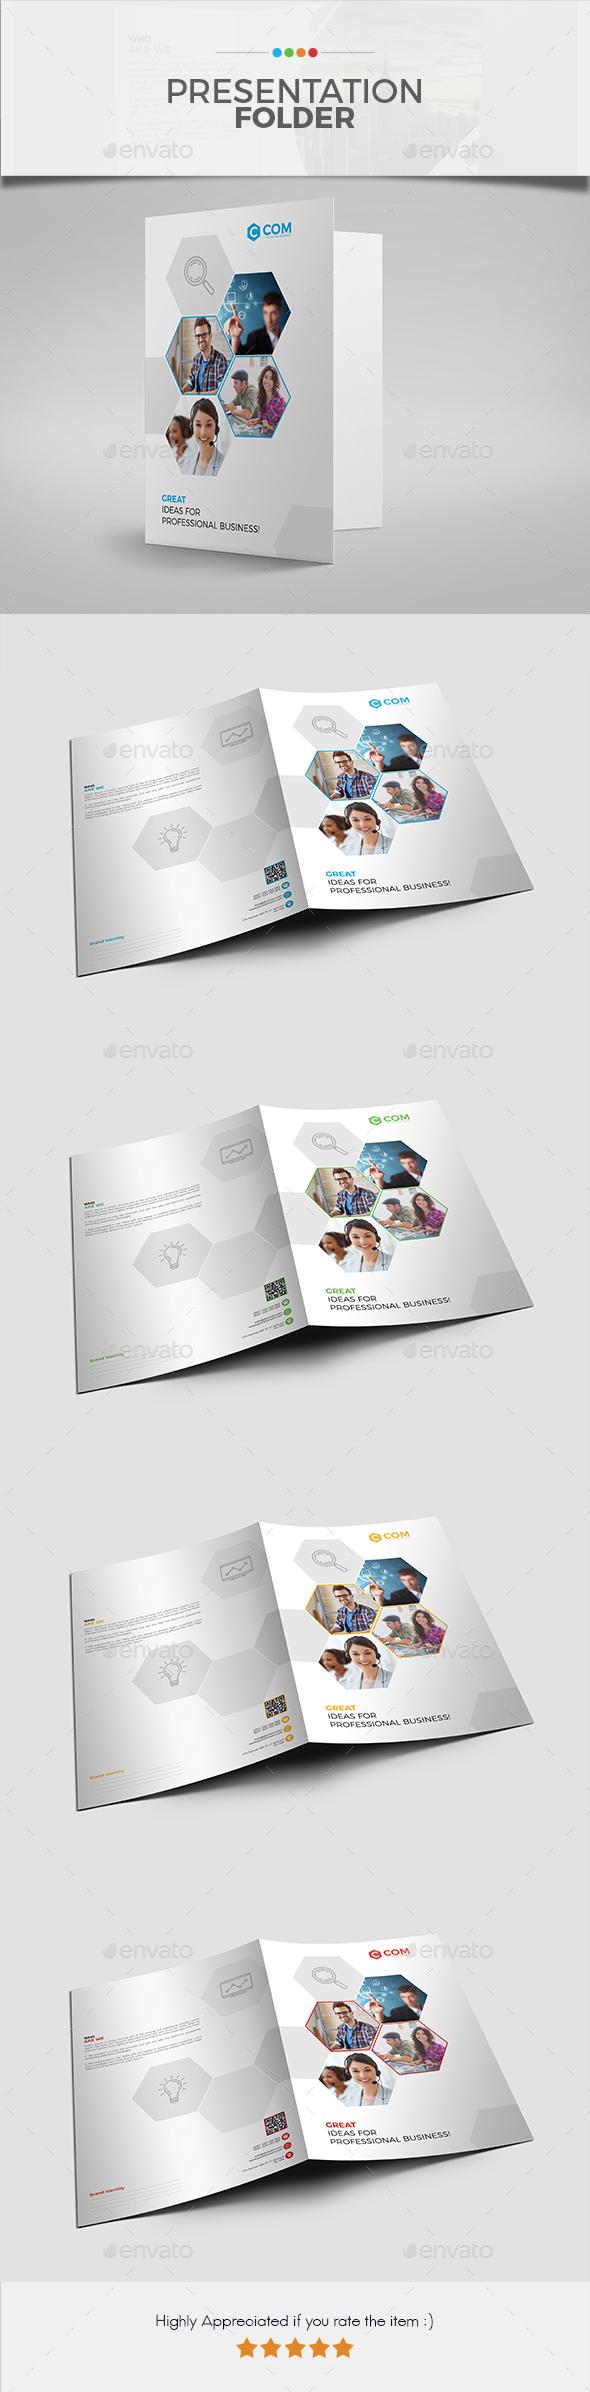 Corporate Presentation Folder 04 - Stationery Print Templates